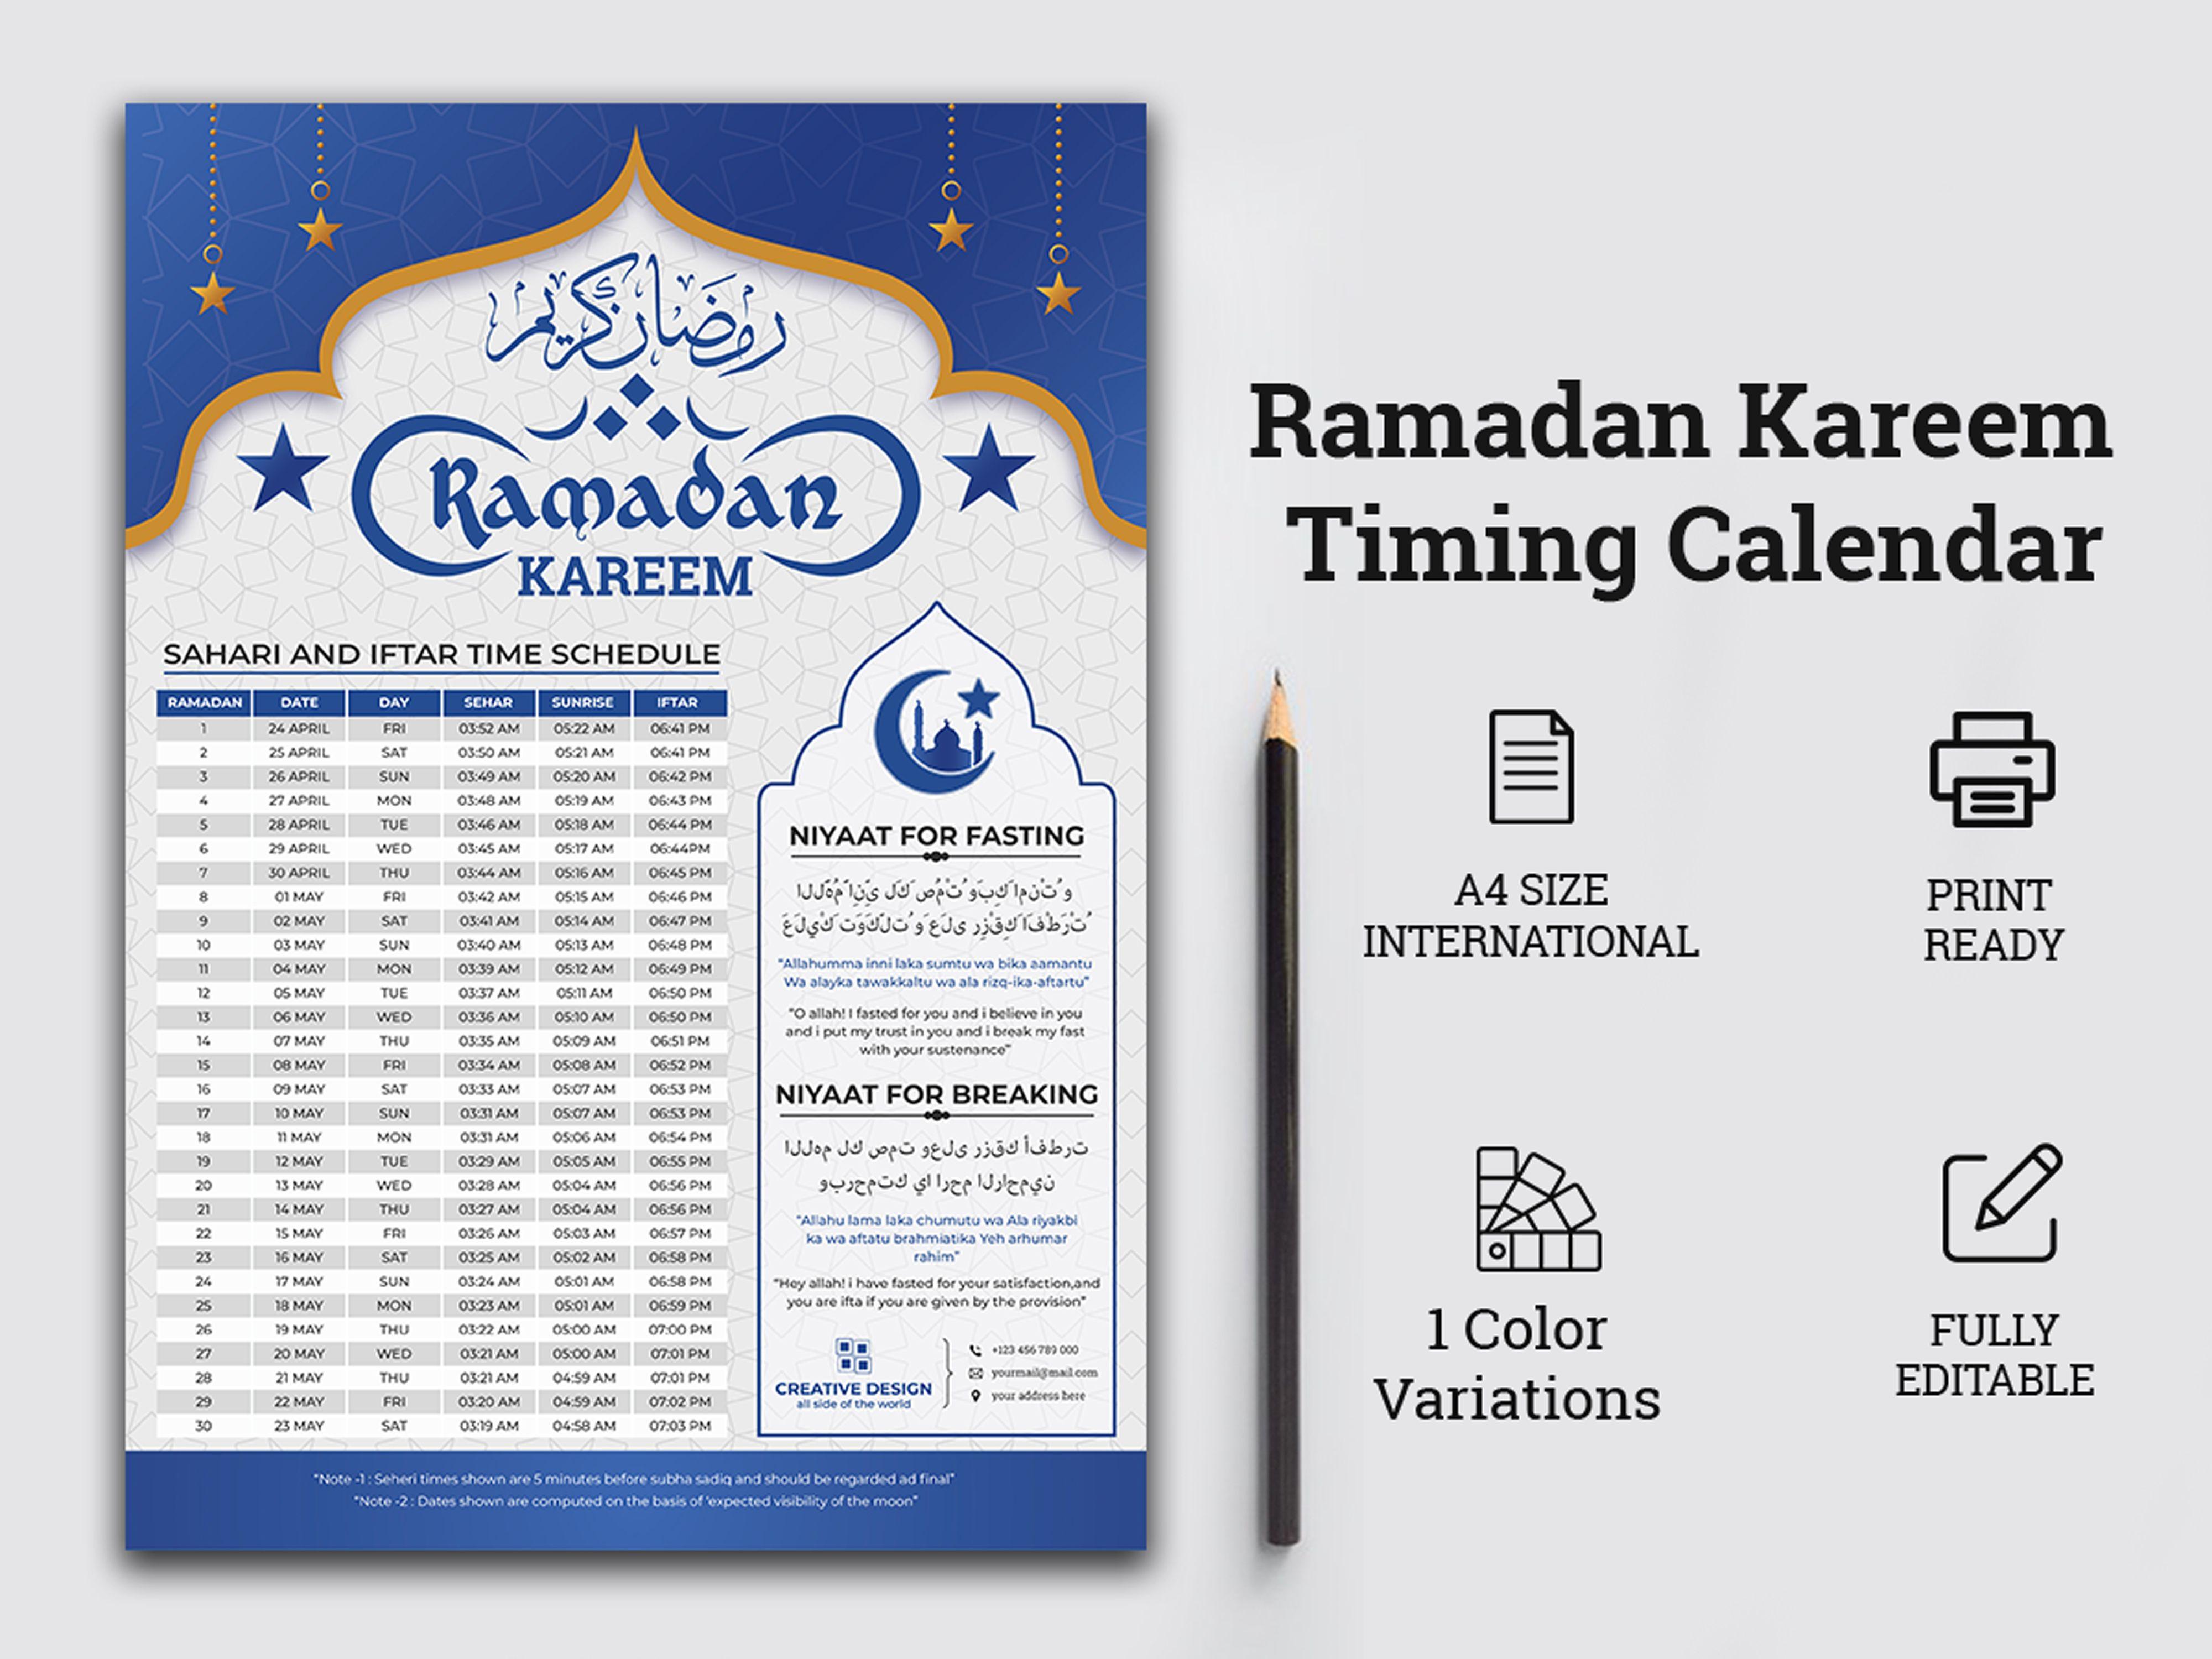 Ramadan Kareem Timing 2021 Calendar Iftar Sheri Iftar Sheri Calendar Arabic Calendar Ramadan Ramadan Kareem Prayer Times